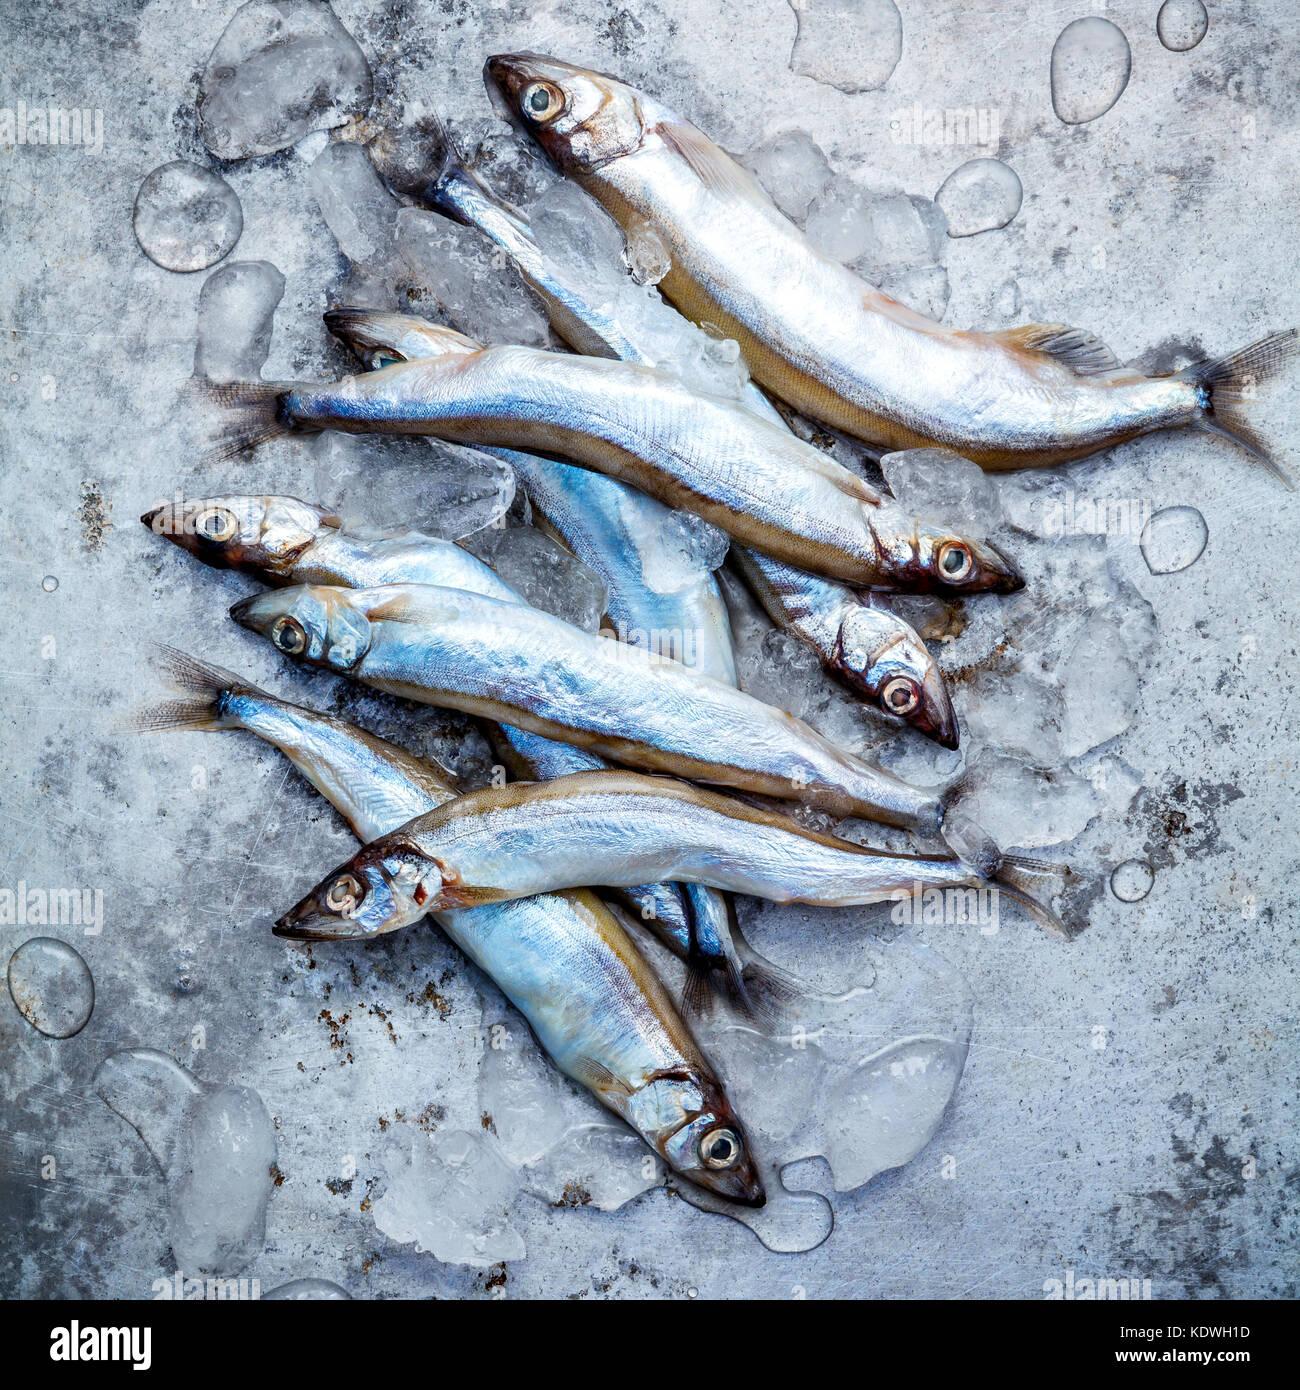 Fresh catch Shishamo fish fully eggs flat lay on shabby metal background. Shishamo fish is popular fish for Japanese - Stock Image